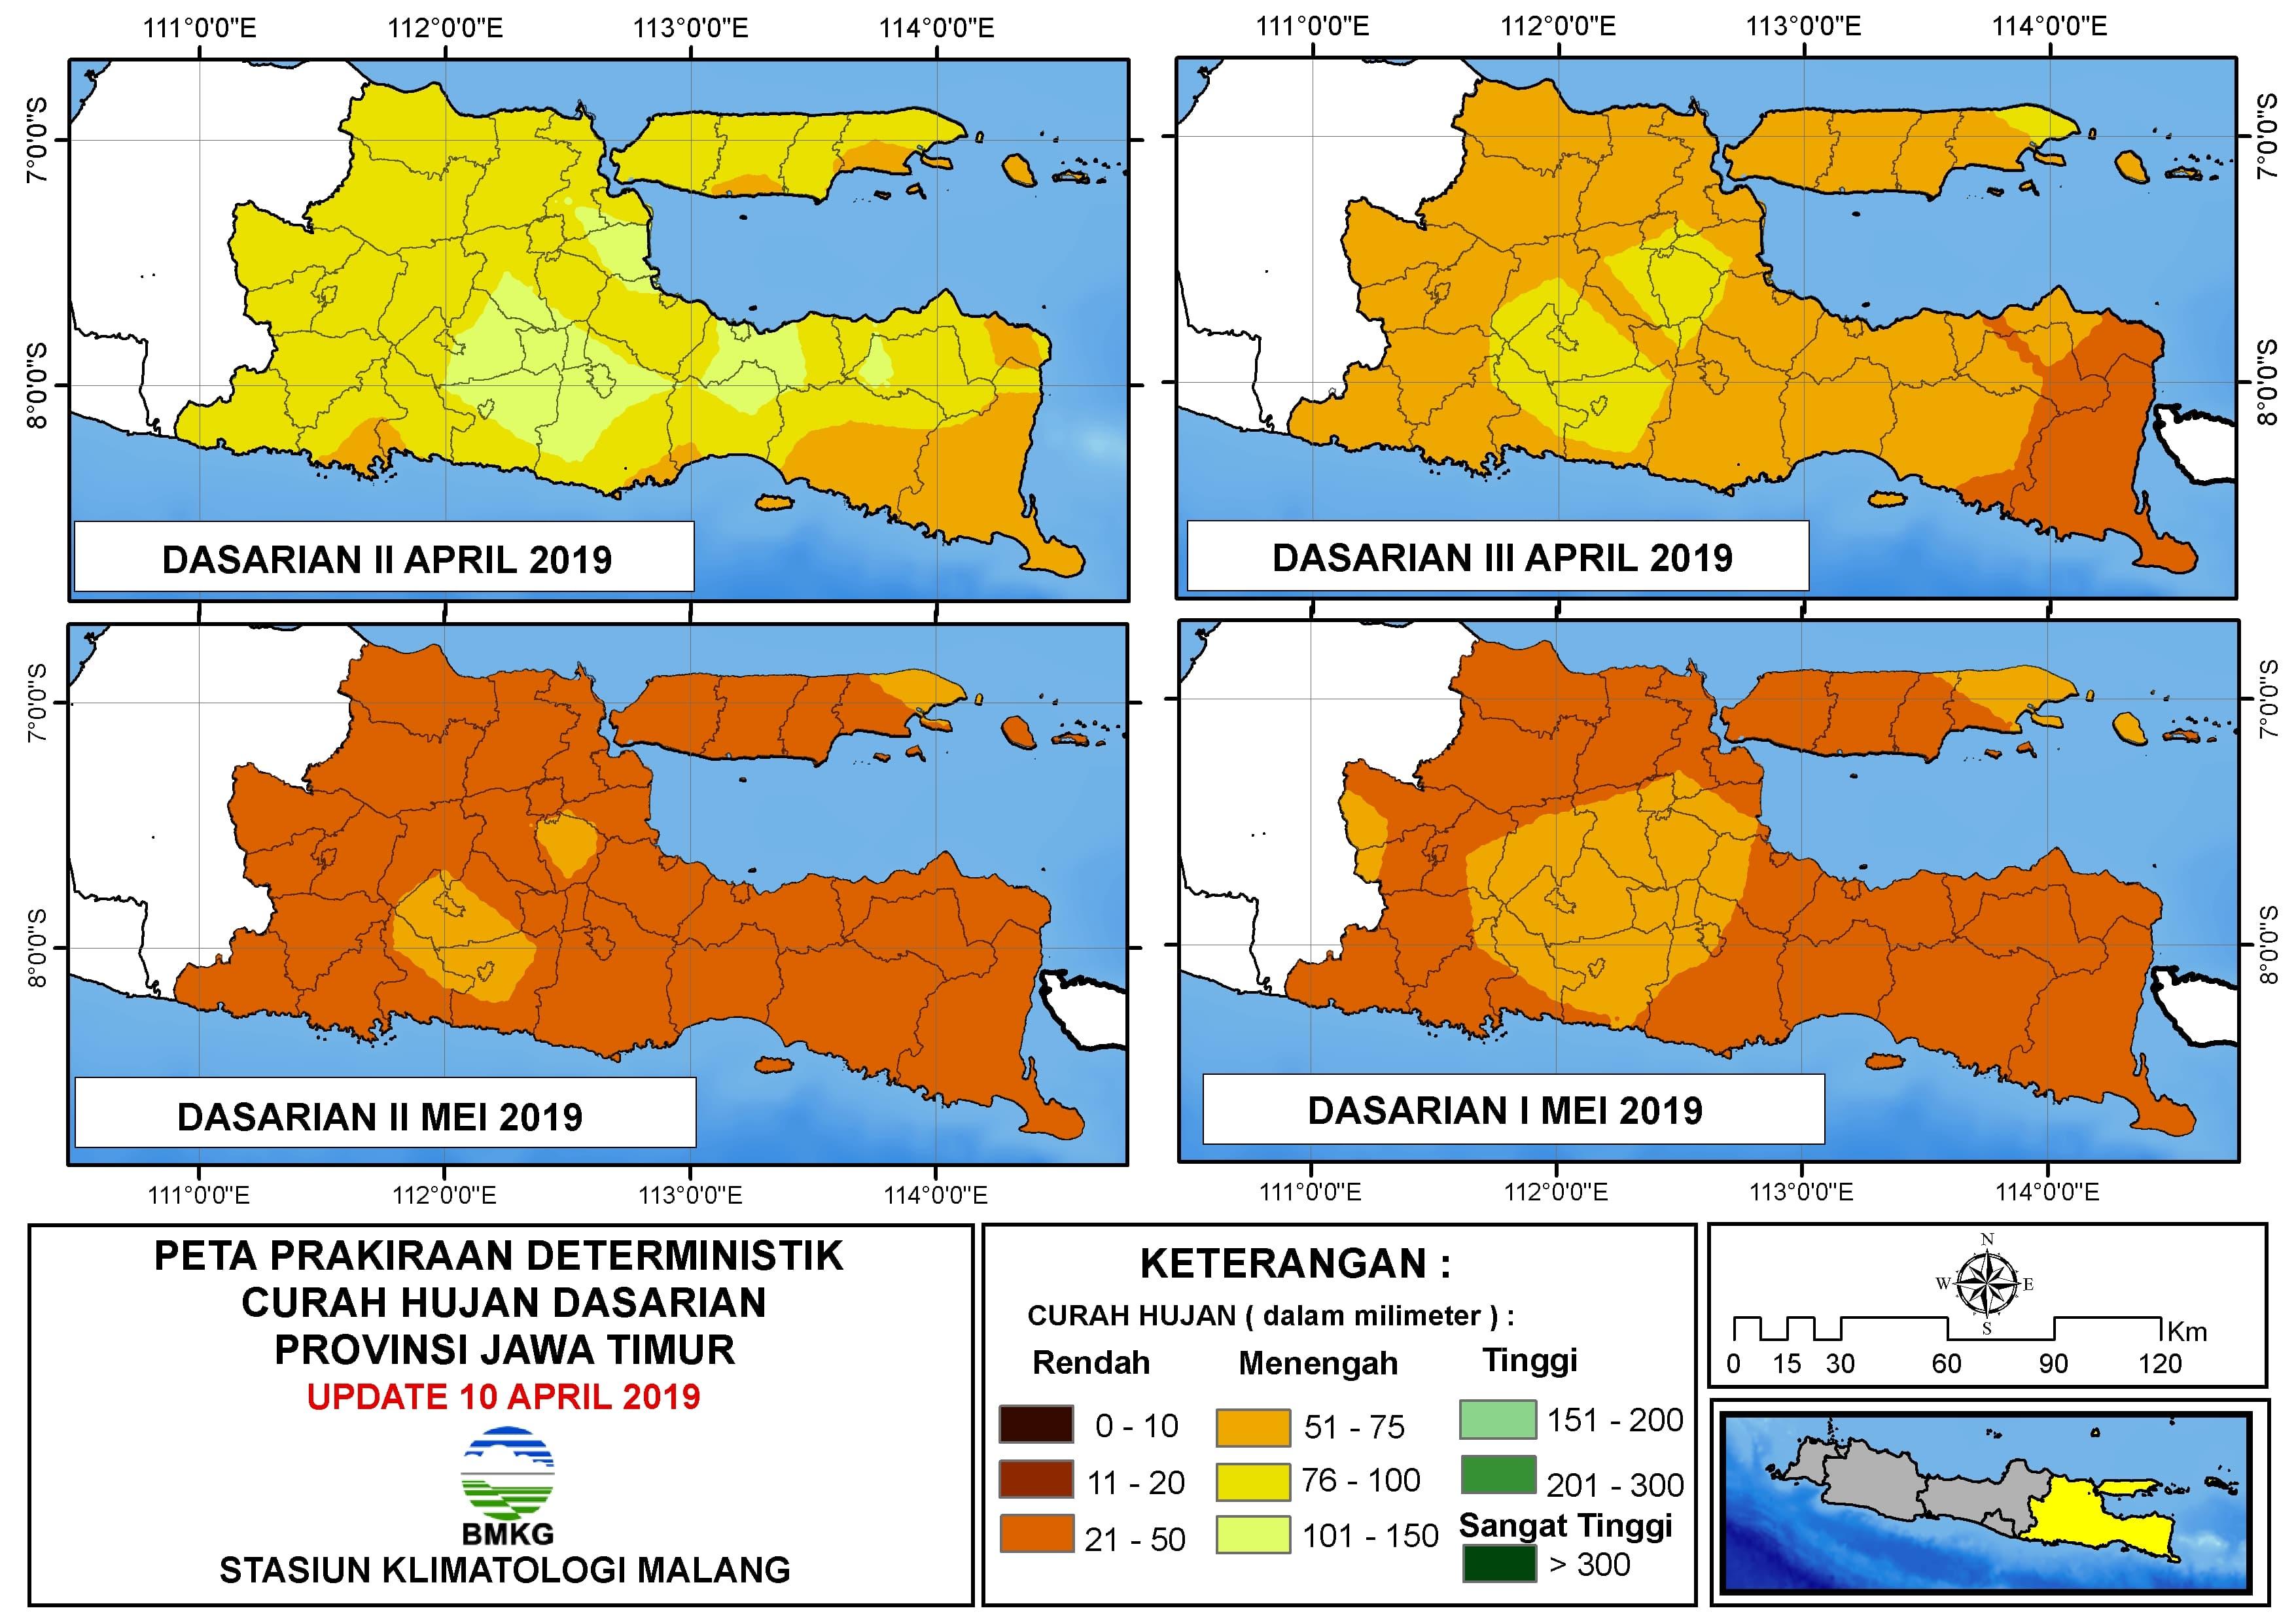 Peta Prakiraan Deterministik Curah Hujan Dasarian Provinsi Jawa Timur Update 10 April 2019